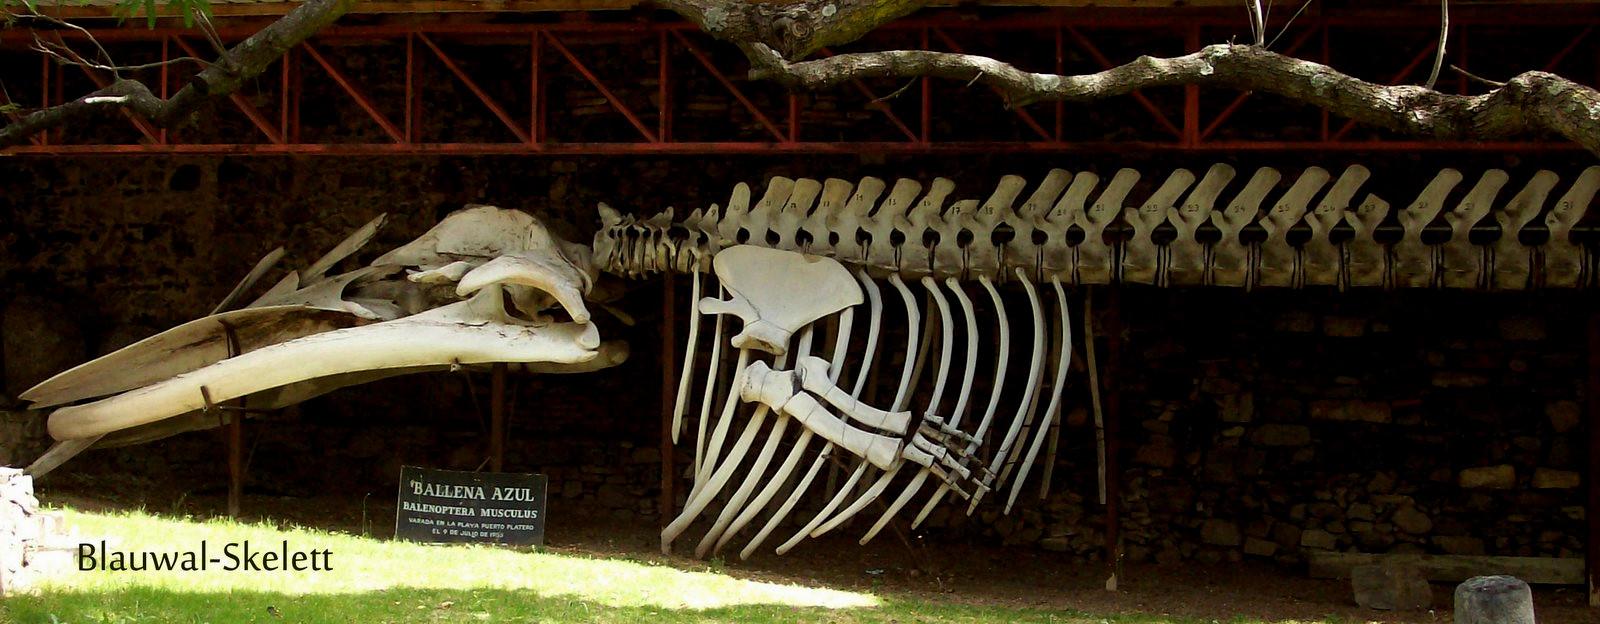 Skelett eines Blauwals in Colonia del Sacramento - Uruquay